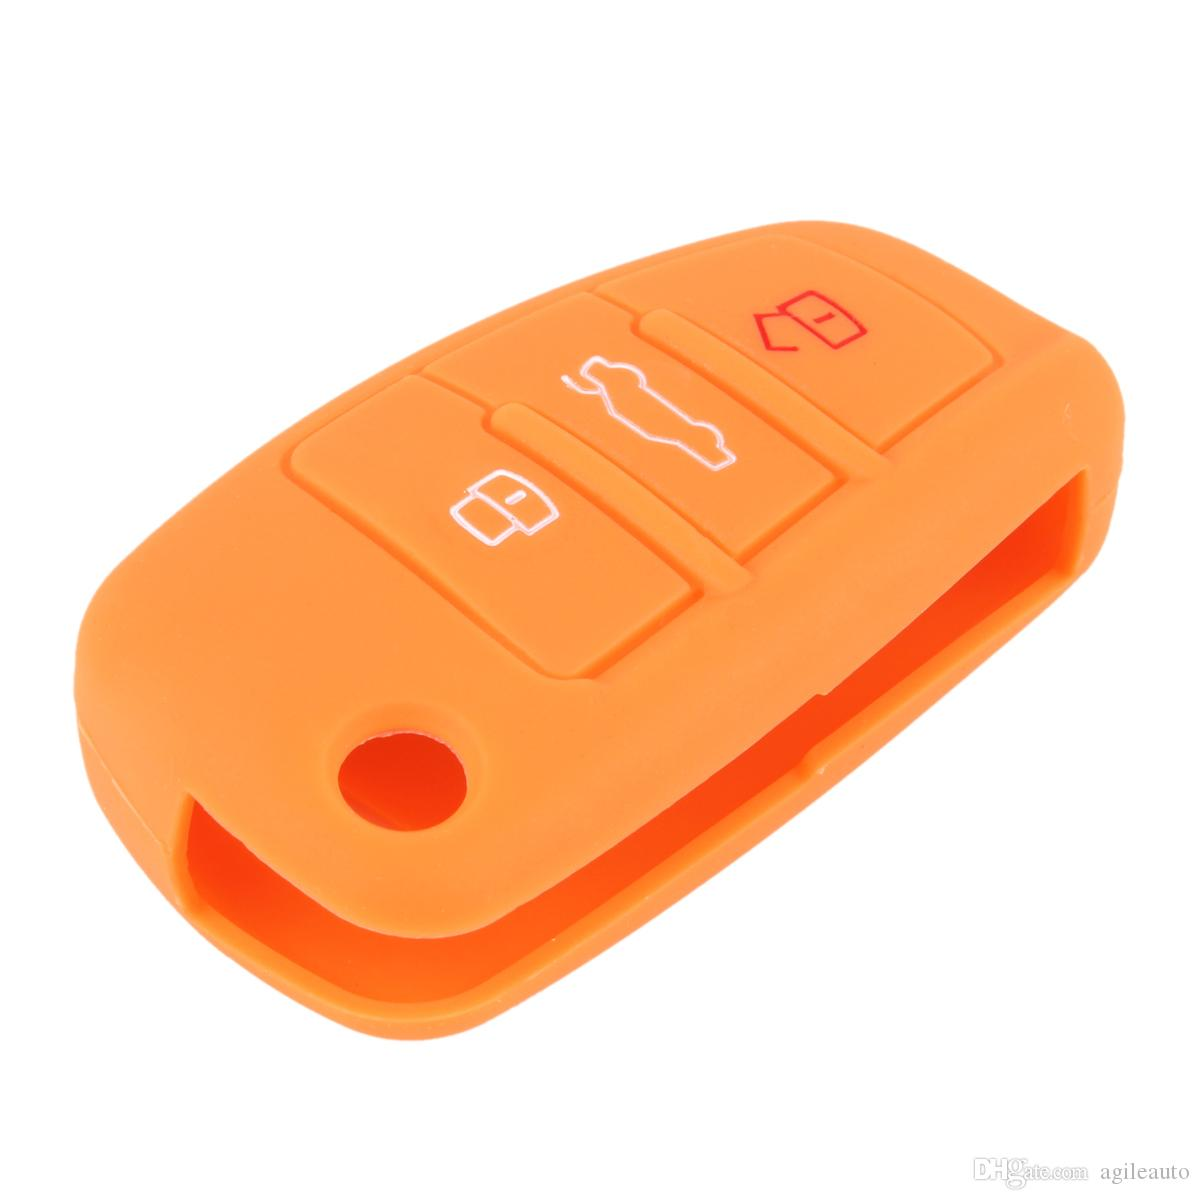 Car Auto Silicone Key Case Cover For Audi A1 A3 Q3 Q7 R8 A6L 5 Optional Colors AUP_40I